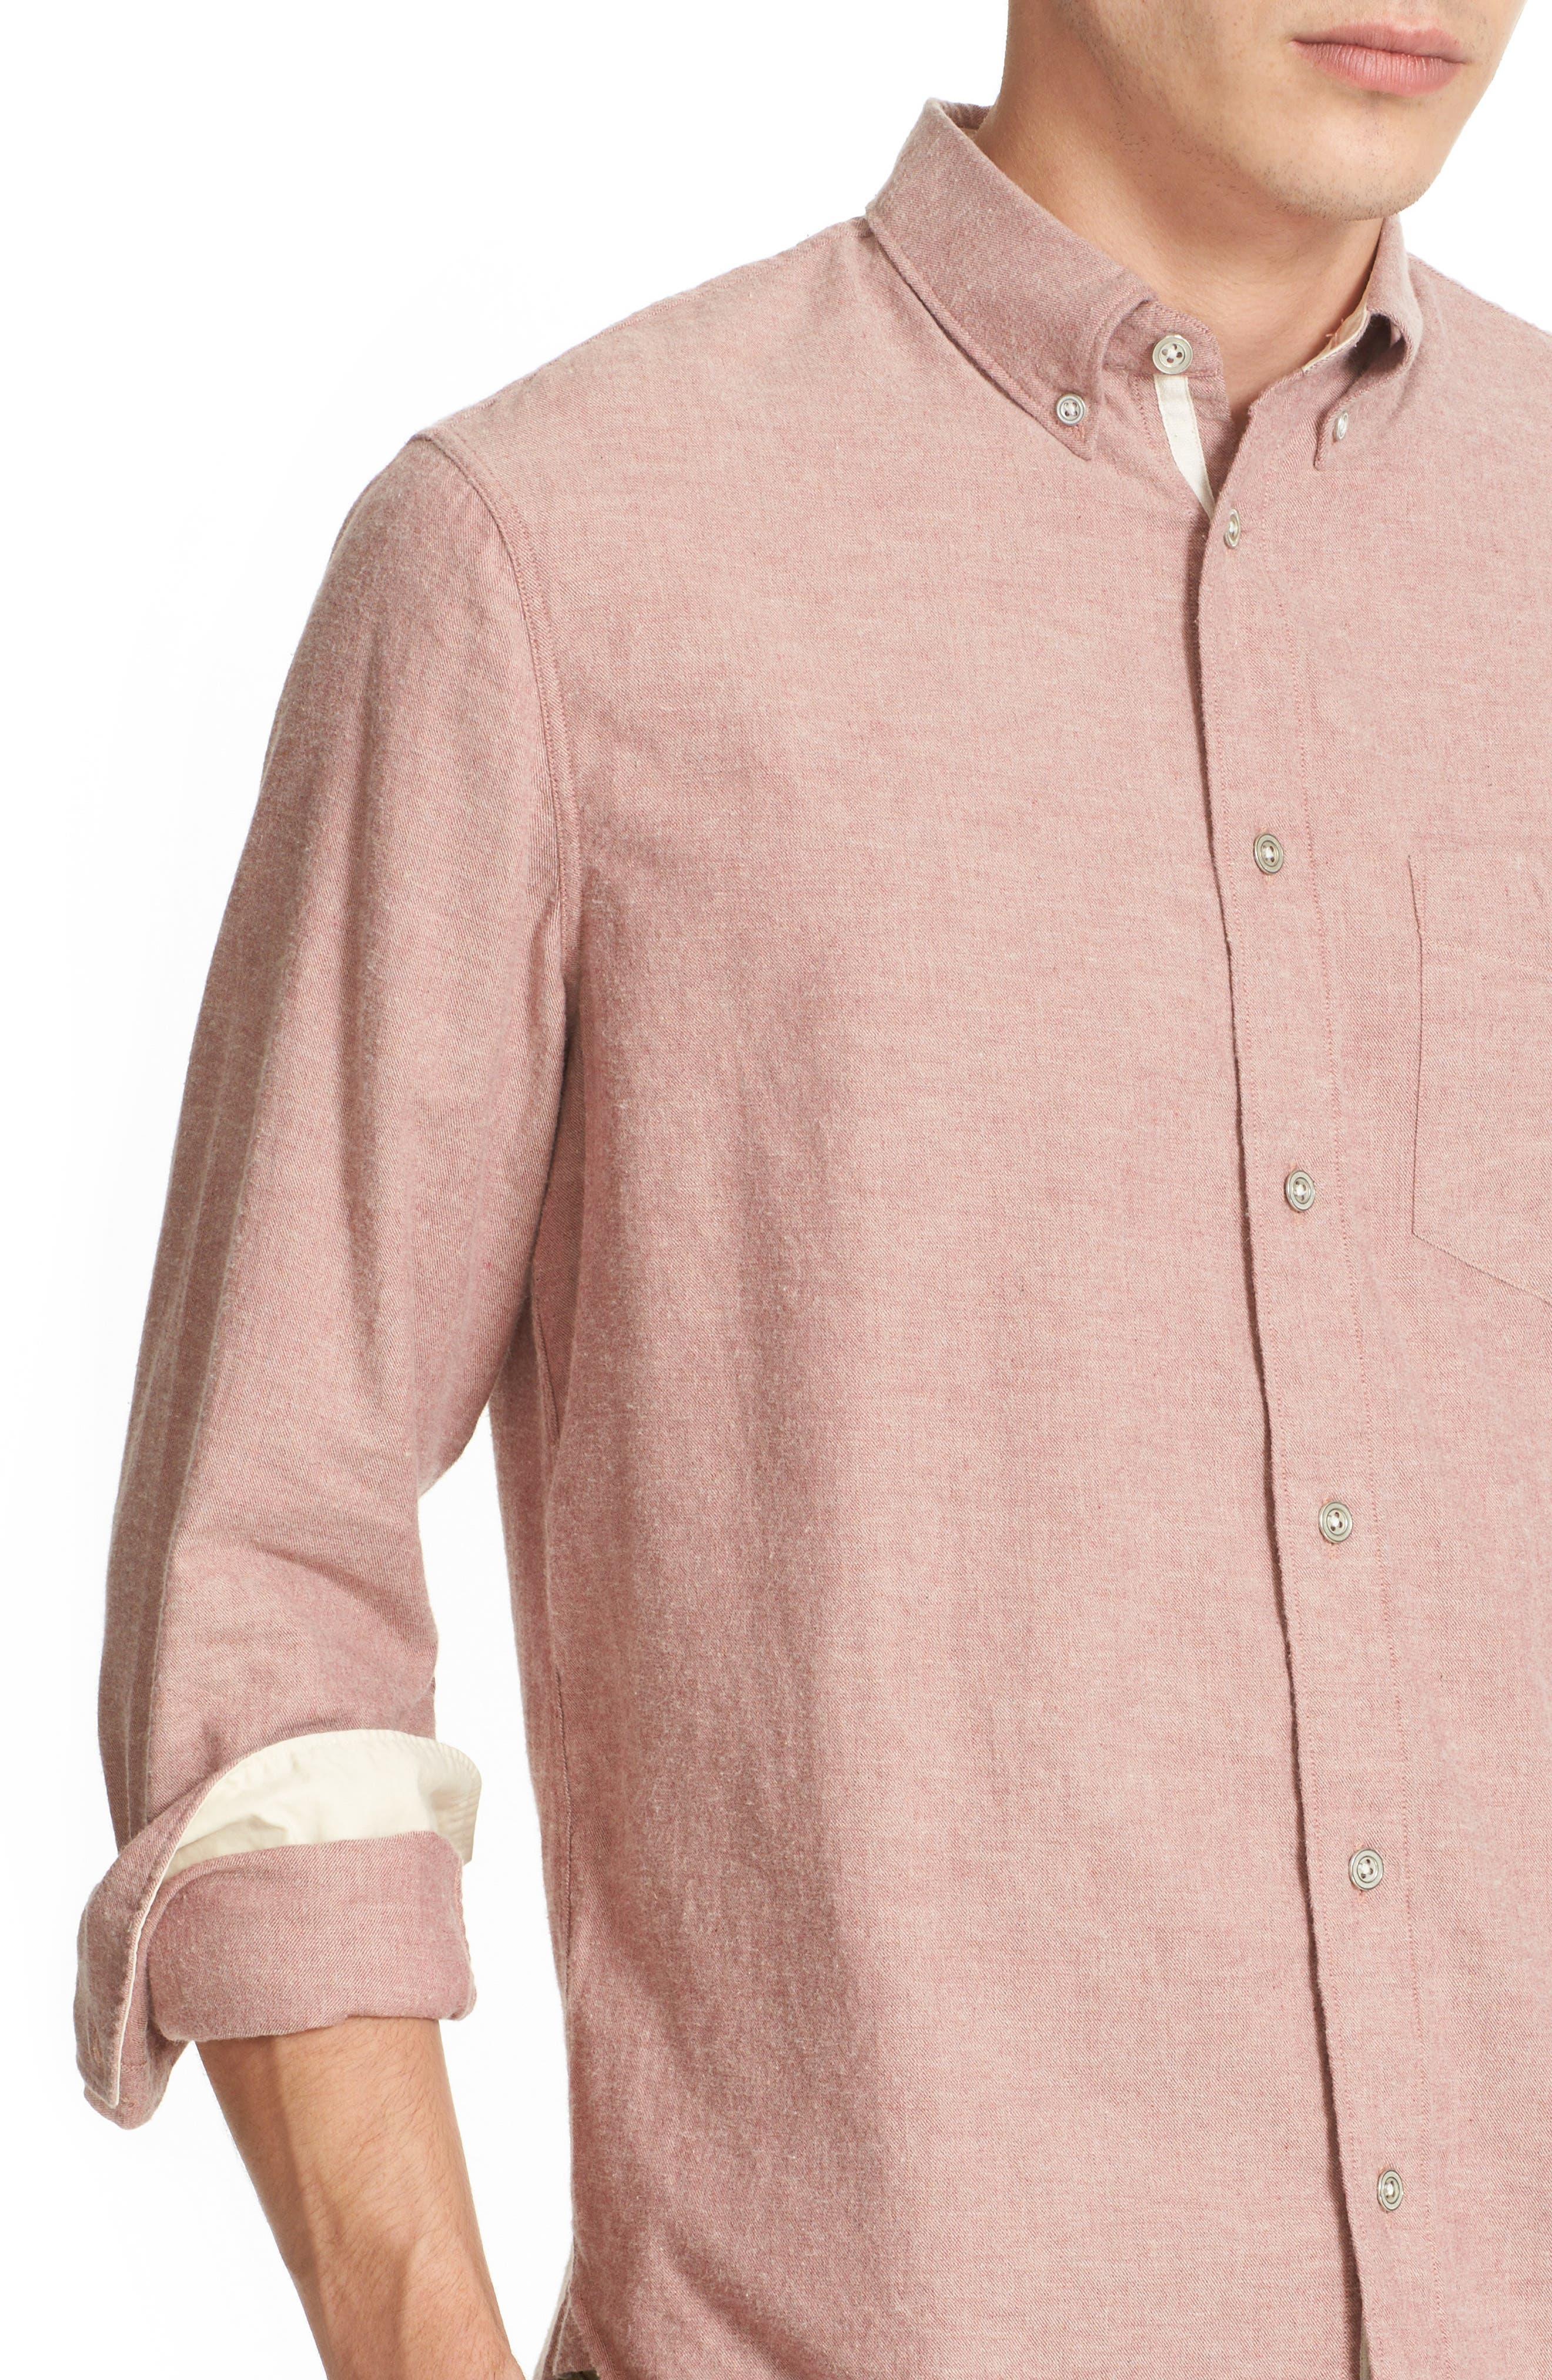 Standard Issue Trim Fit Sport Shirt,                             Alternate thumbnail 5, color,                             650